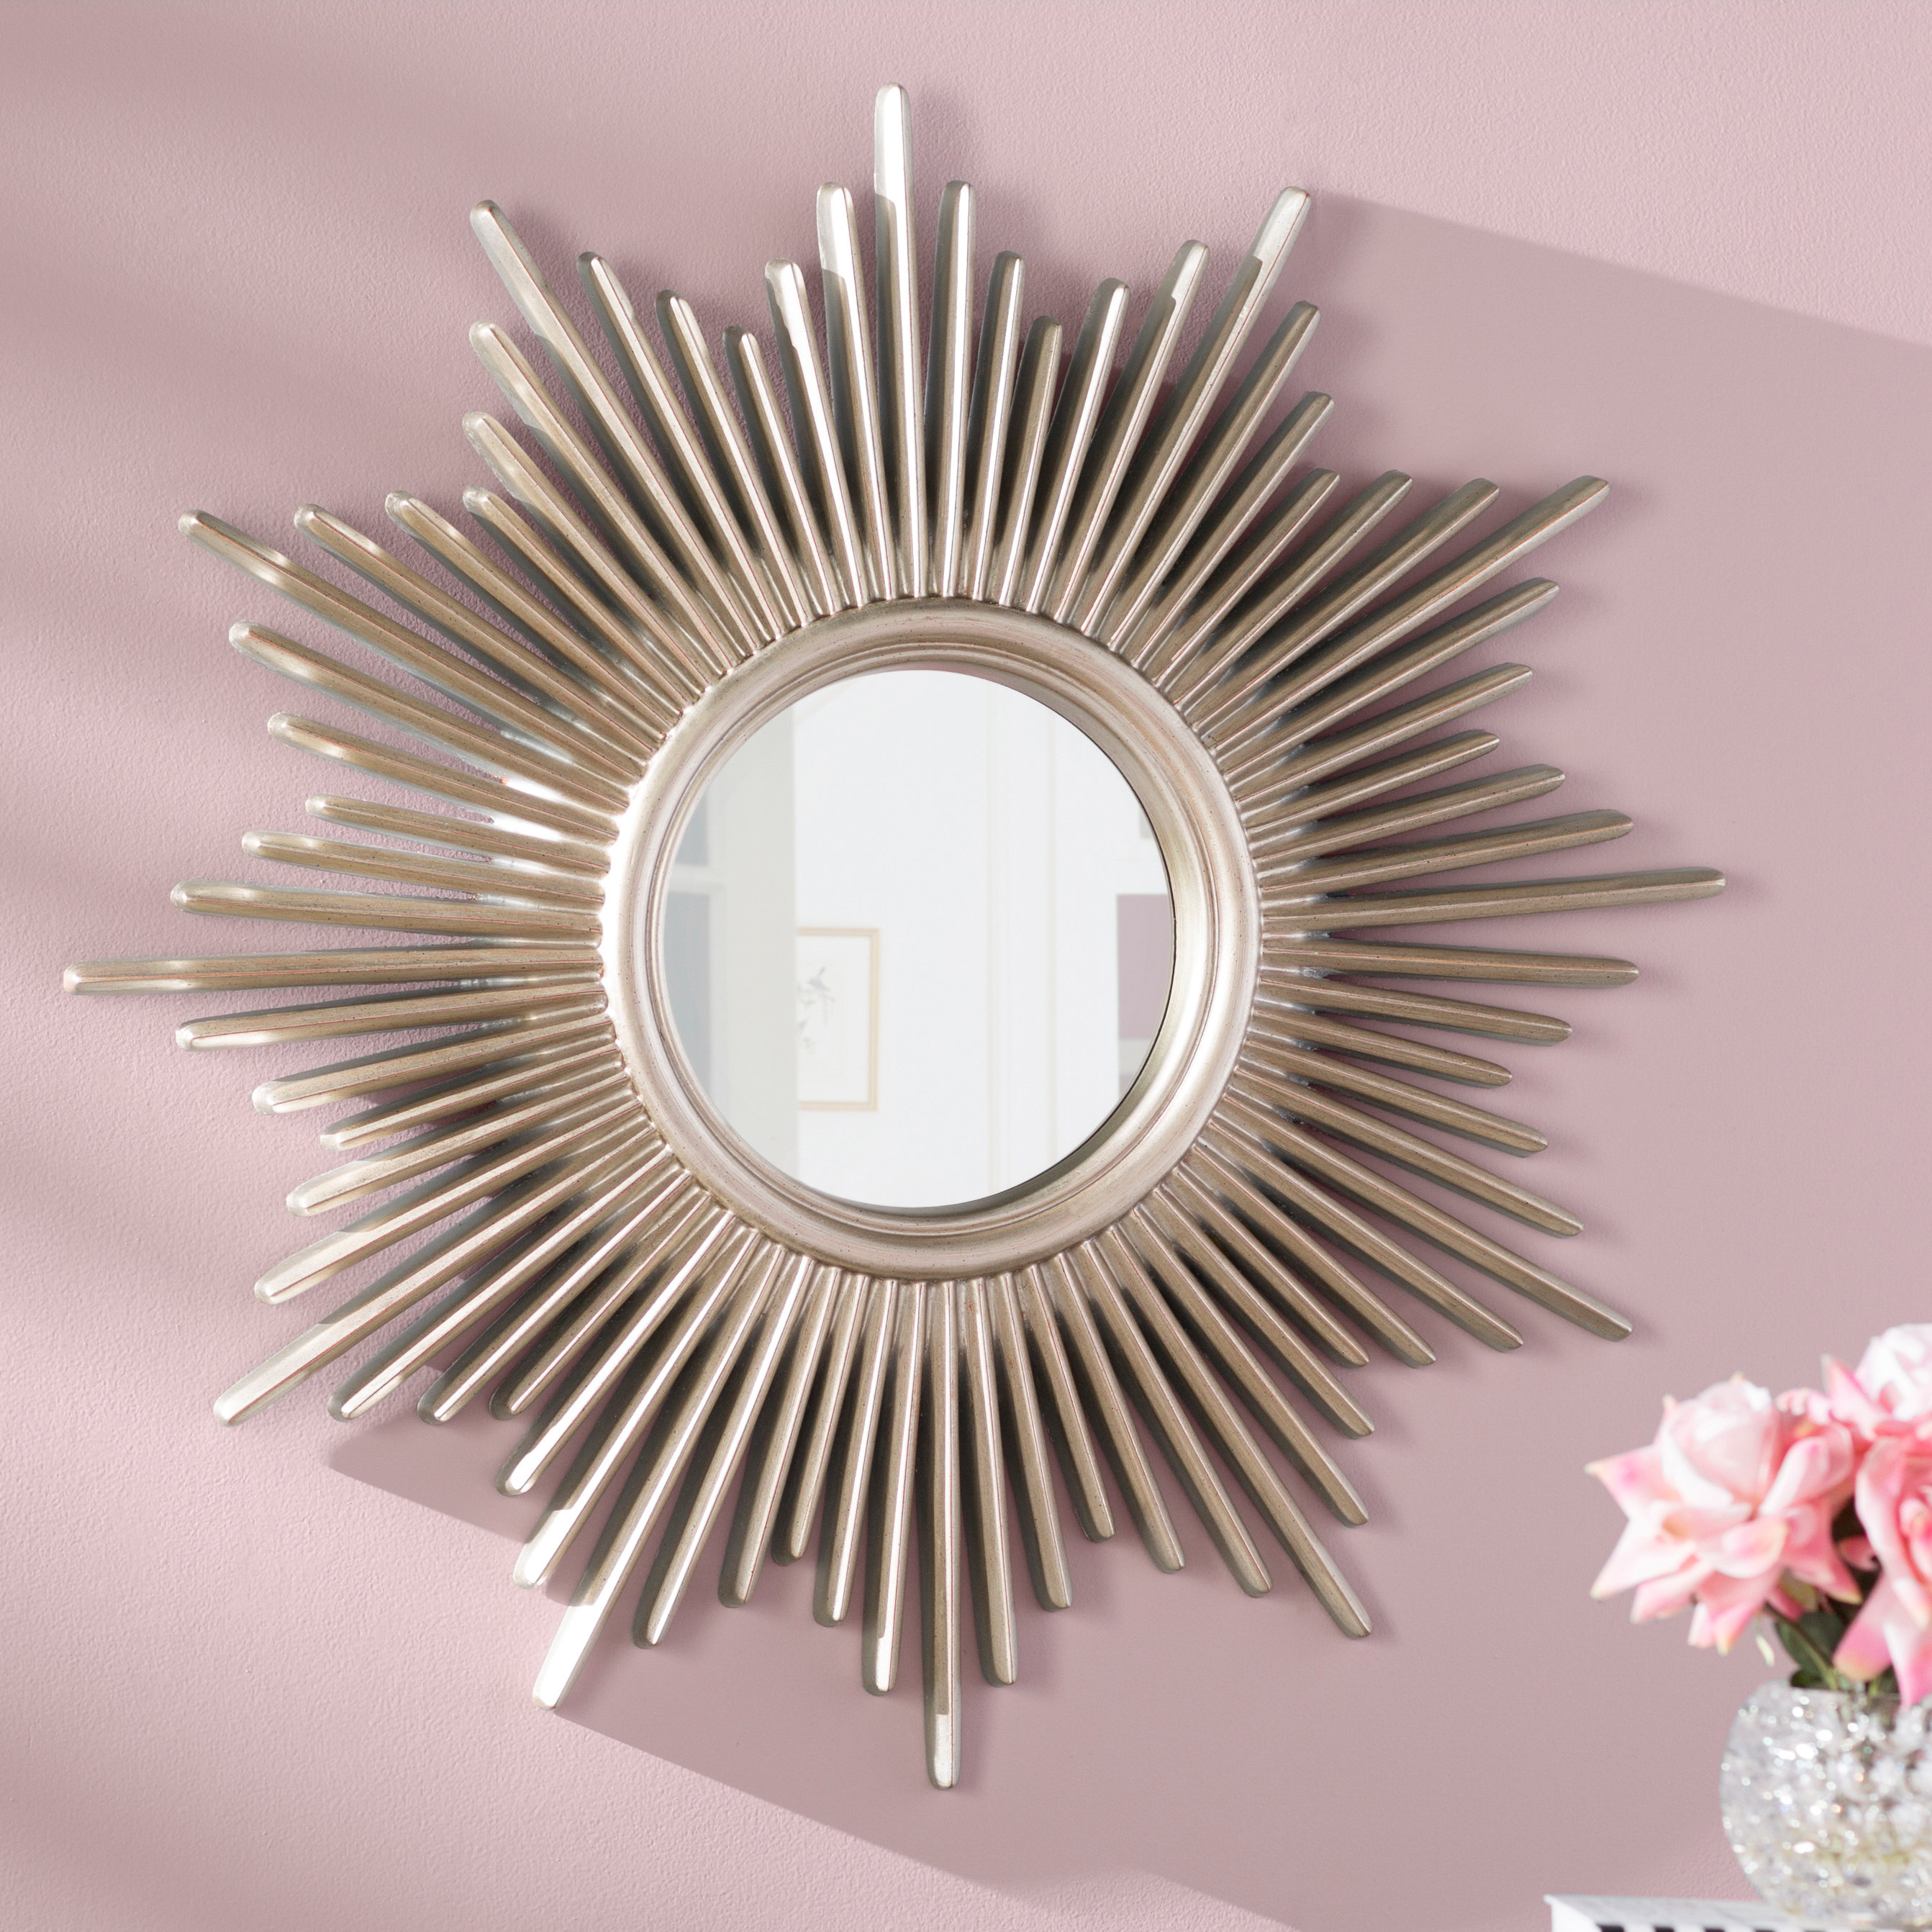 Josephson Starburst Glam Beveled Accent Wall Mirror Regarding Glam Beveled Accent Mirrors (View 8 of 30)